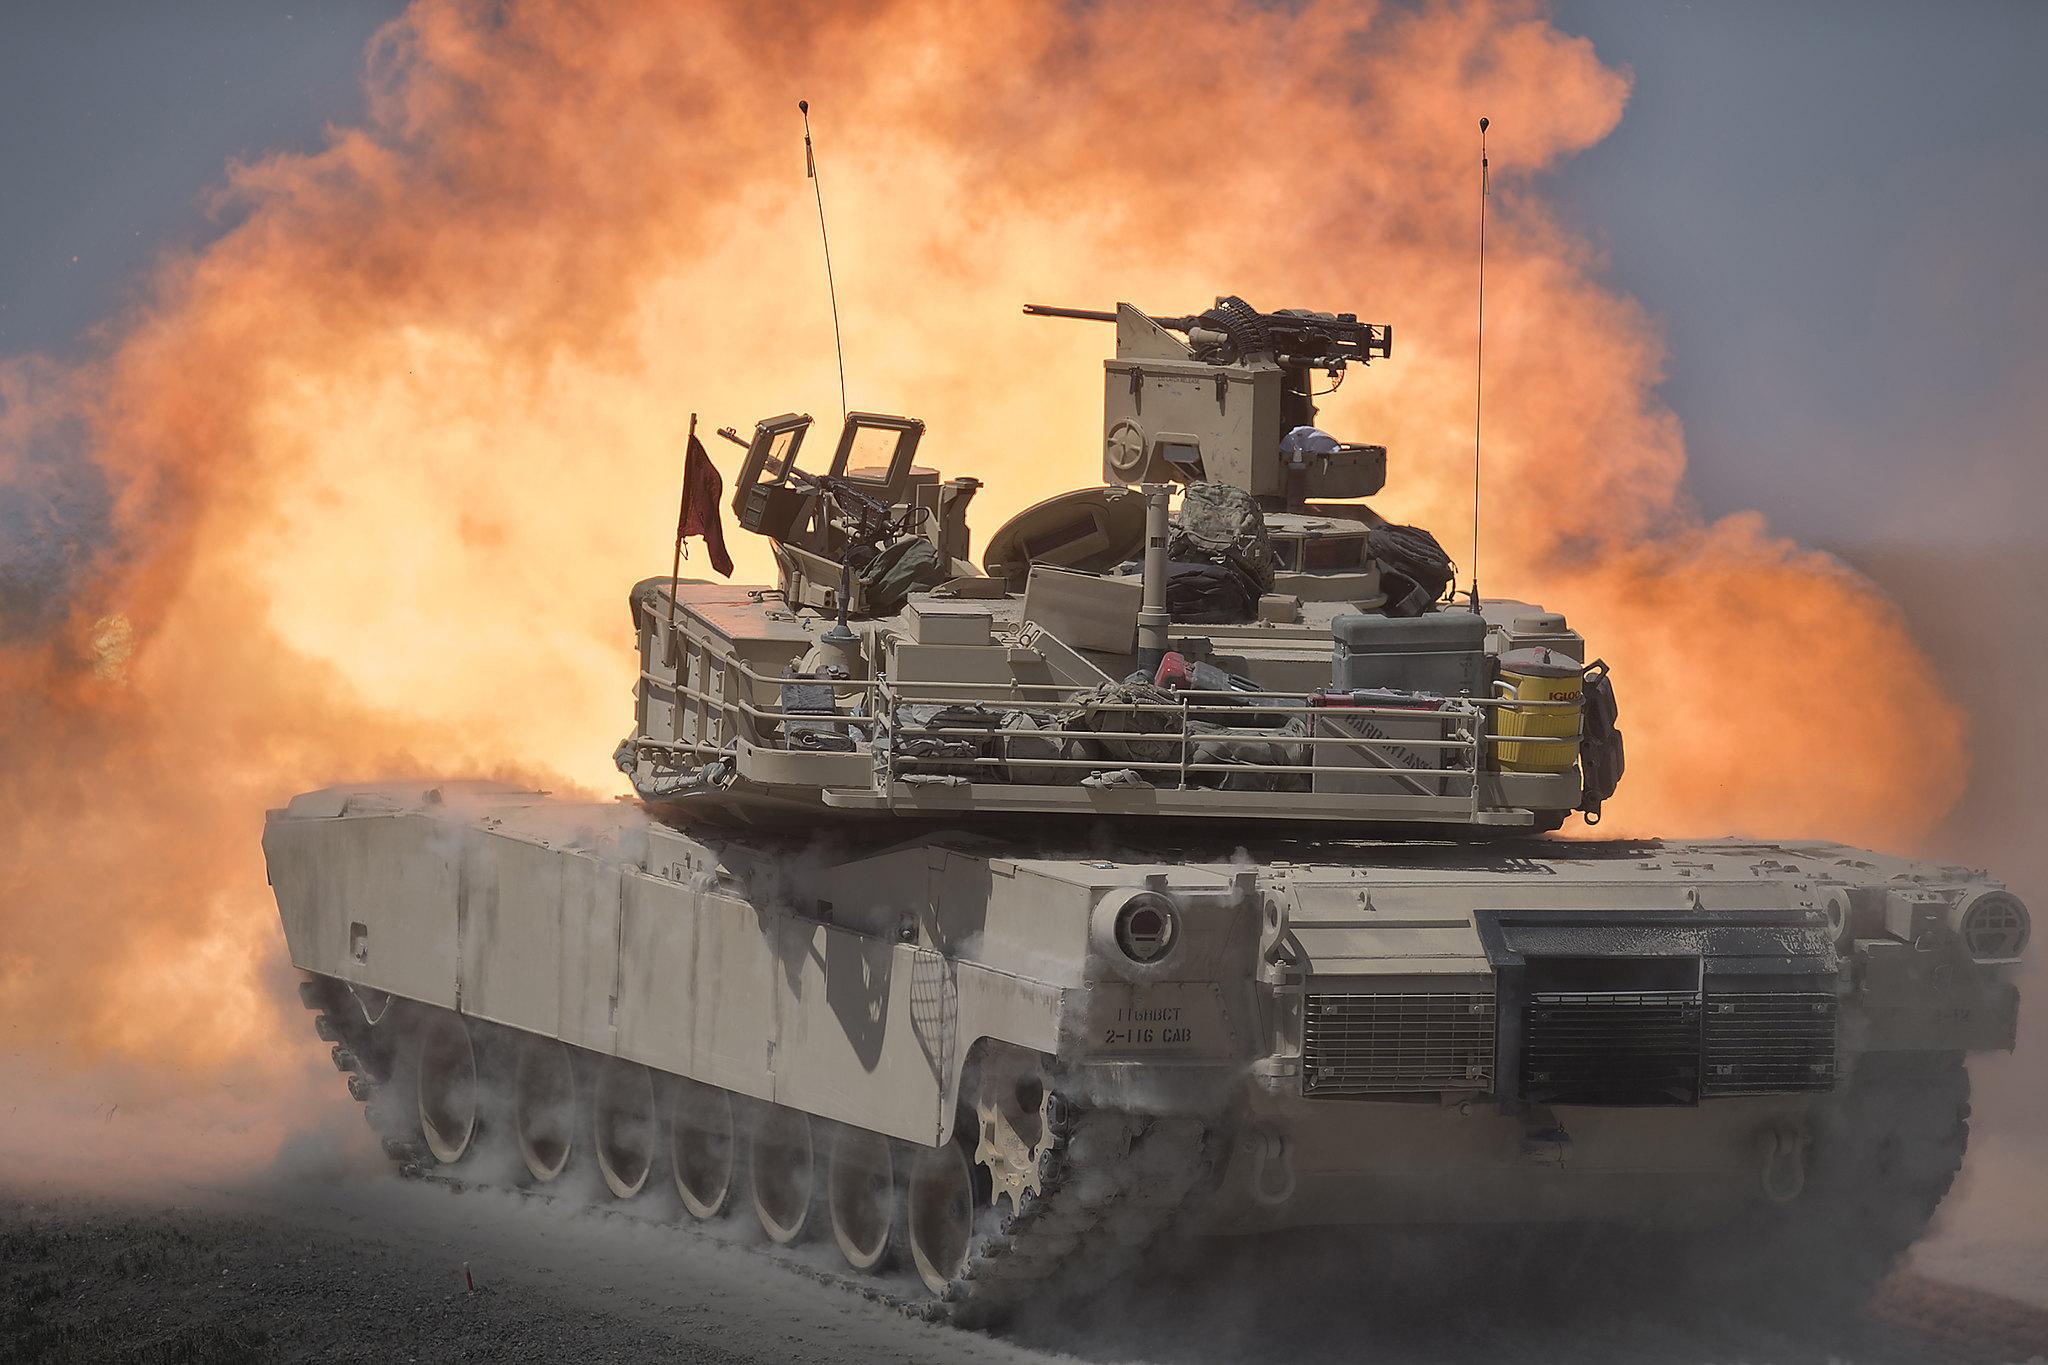 An Idaho Army National Guard tank fires during training at the Orchard Combat Training Center in Boise, Idaho, May 17, 2021. (Thomas Alvarez/Idaho National Guard)